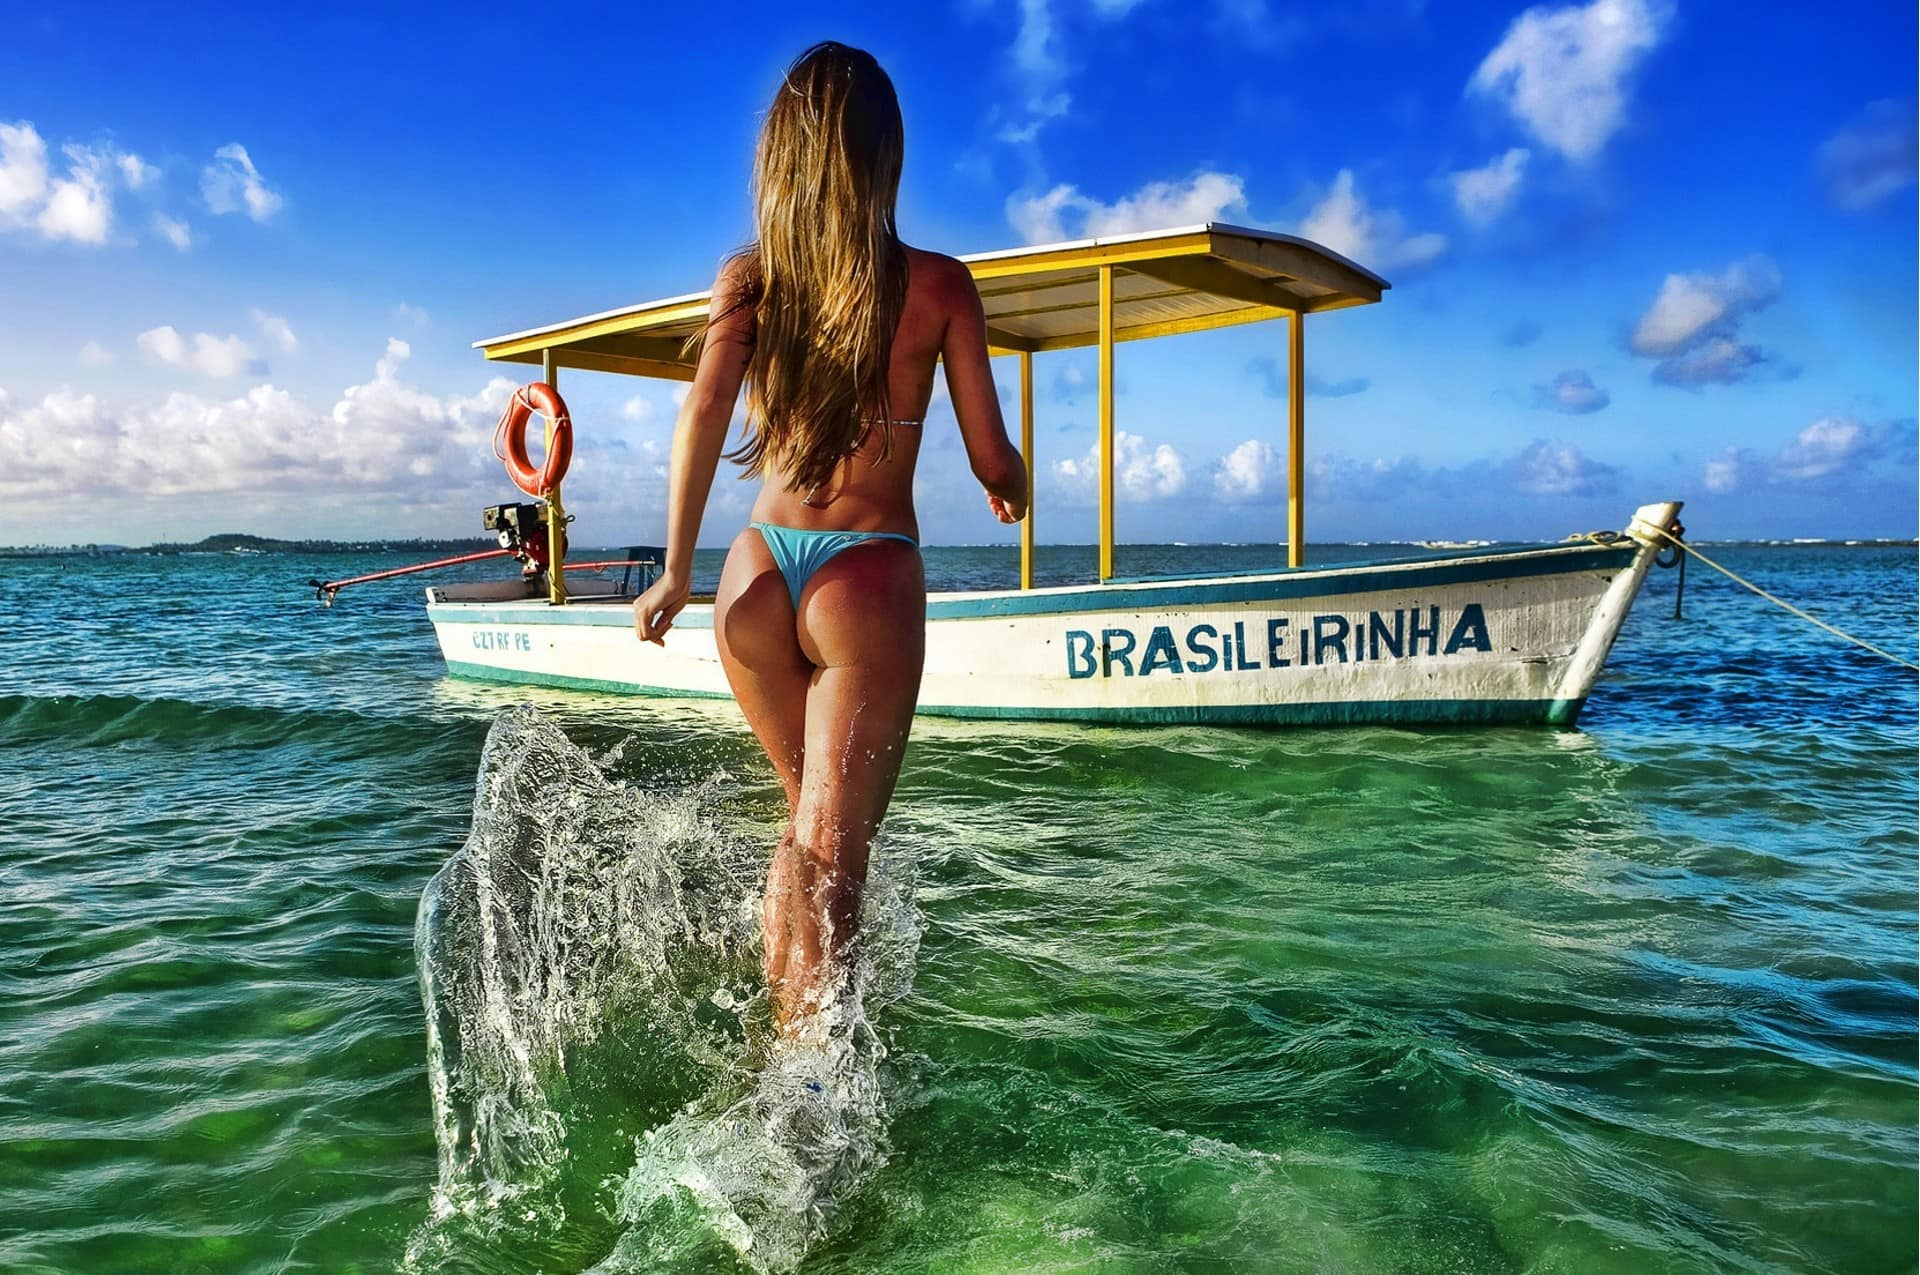 brazilian_girl